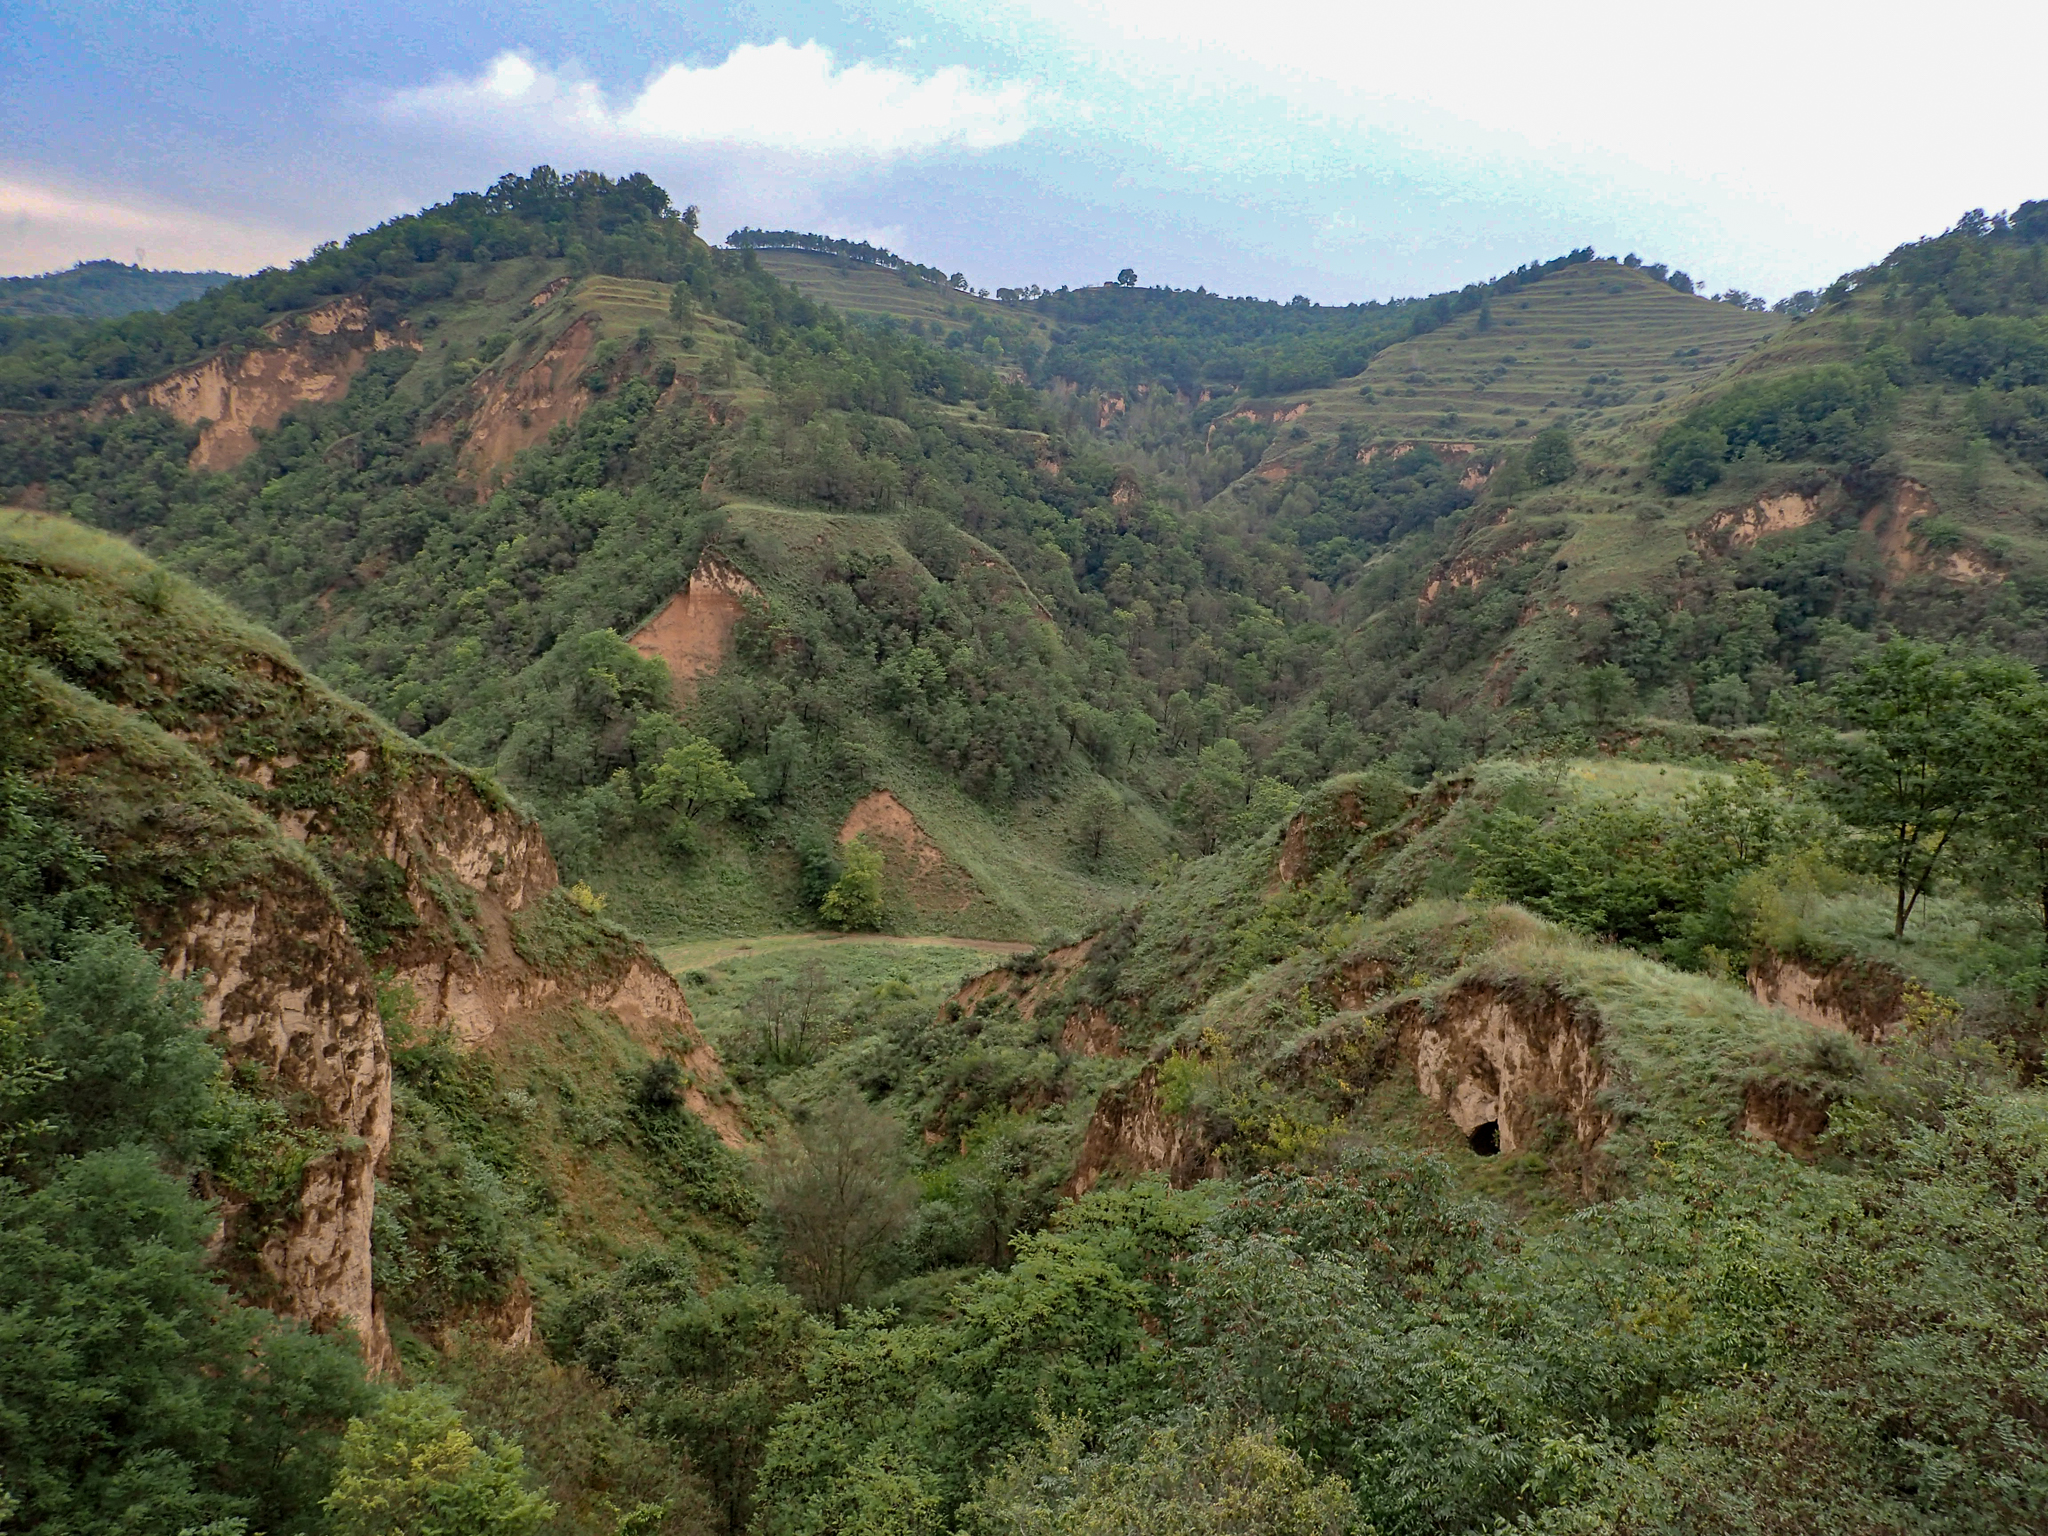 Fantastical countryside